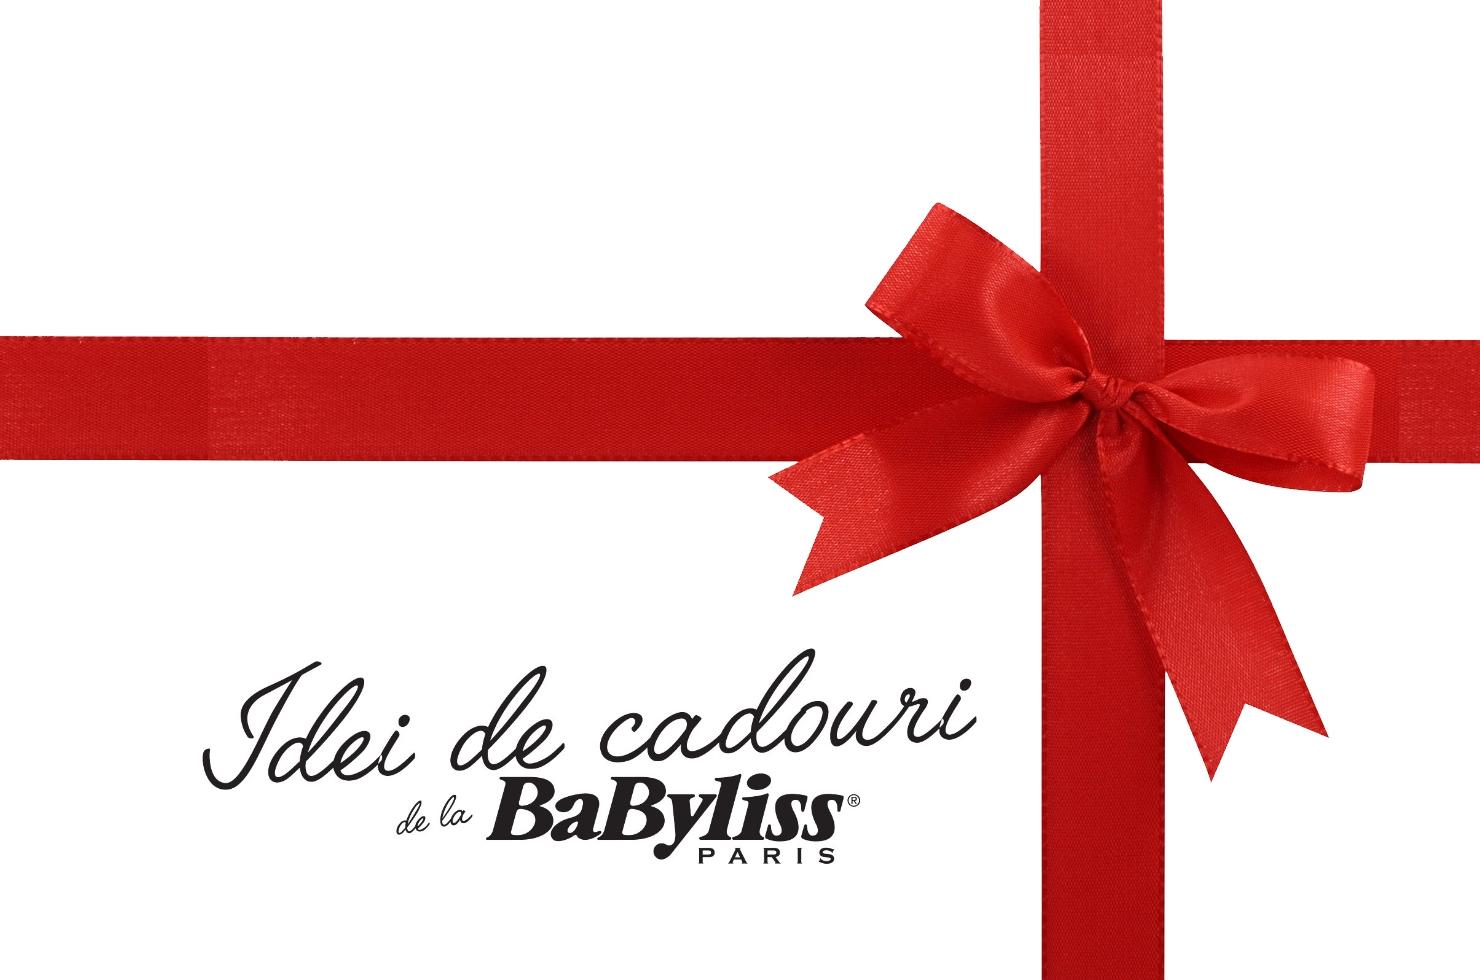 Idei de cadouri BaByliss Paris sigla